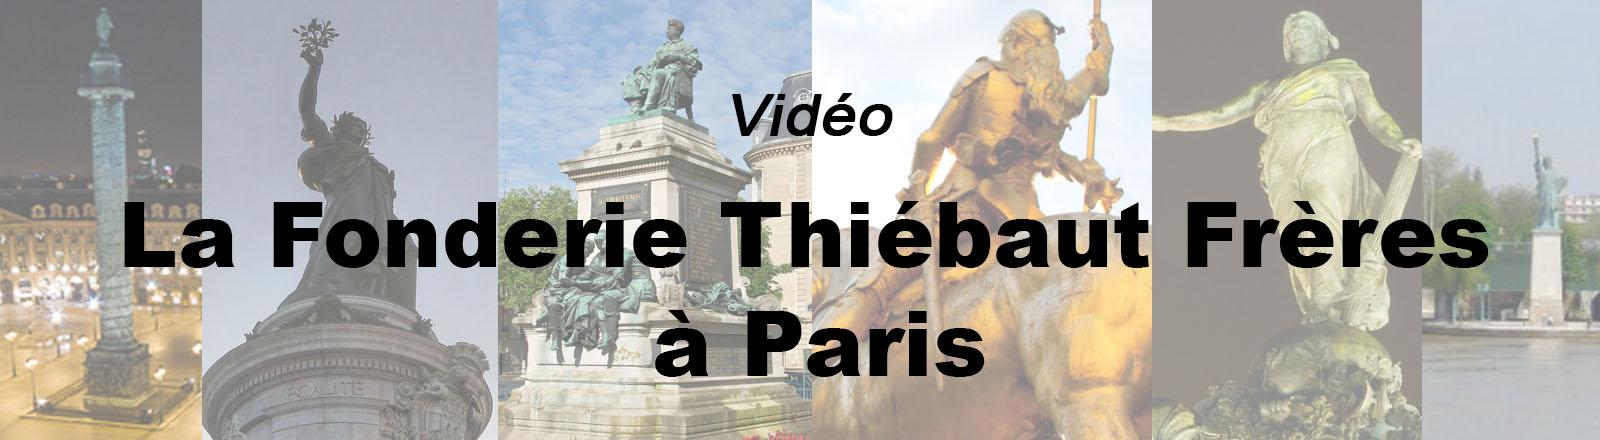 video thiebaut freres à paris